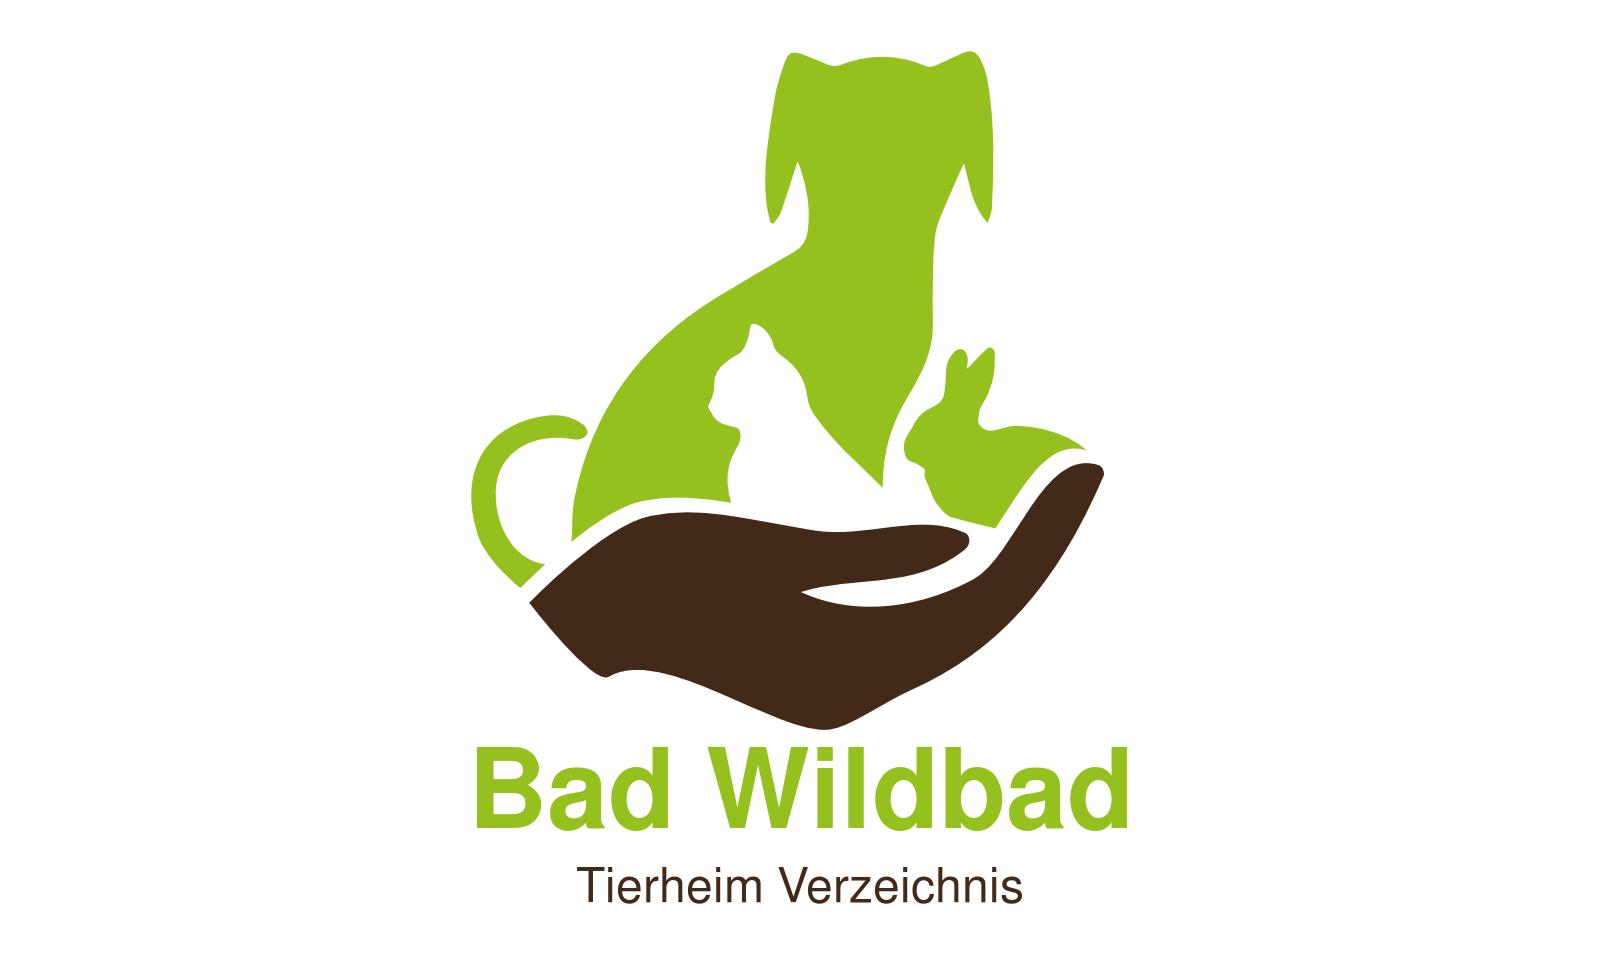 Tierheim Bad Wildbad